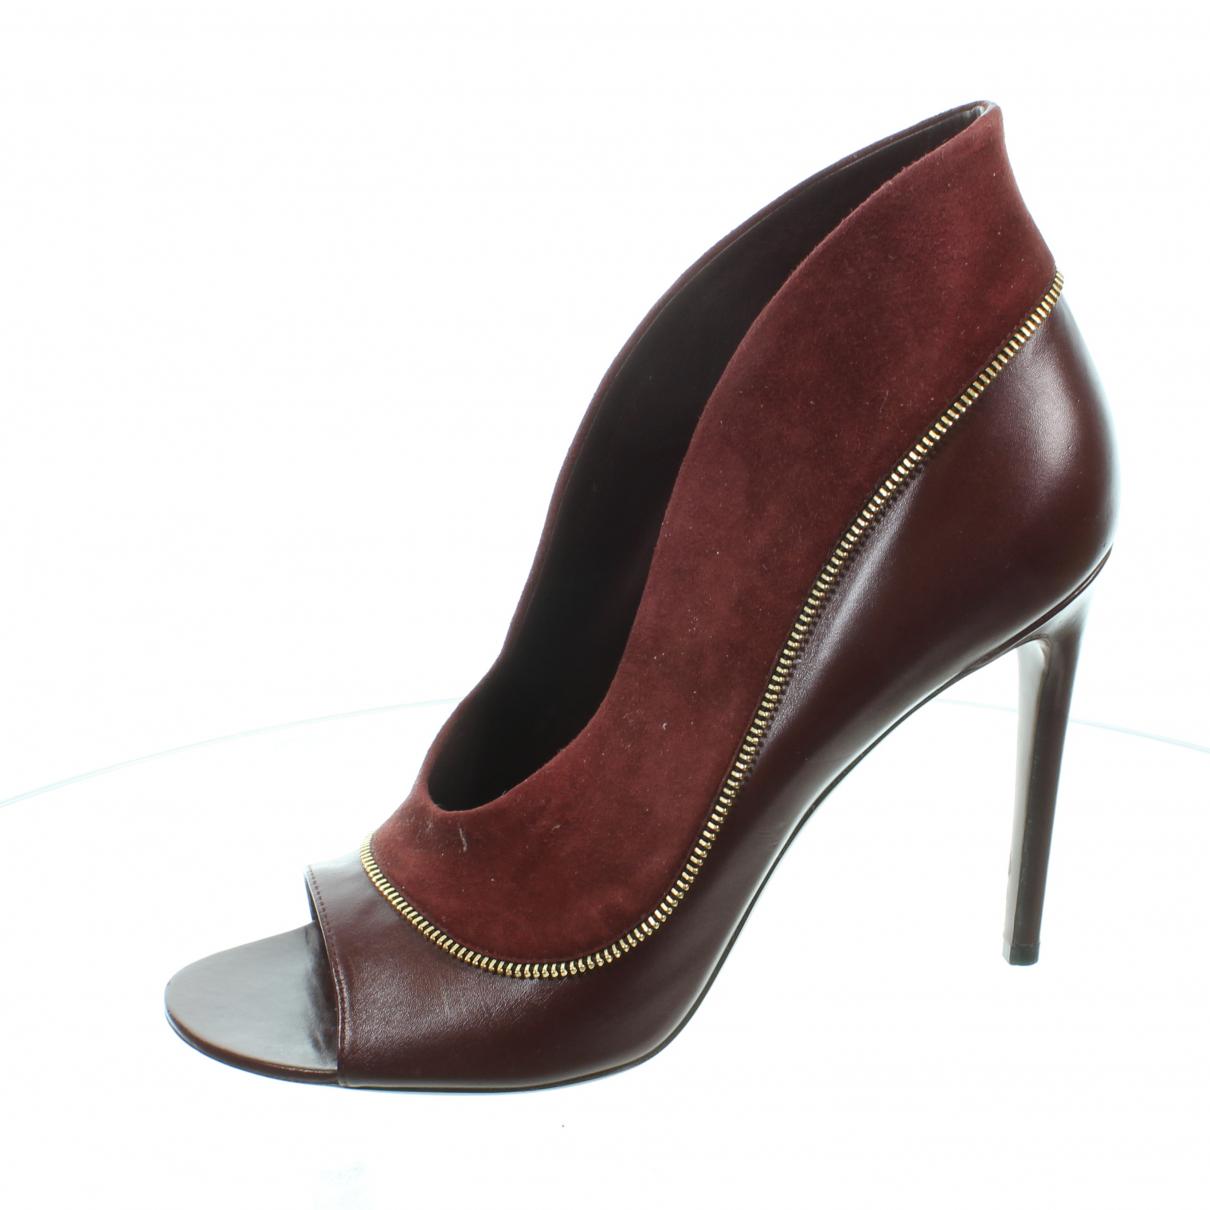 Louis Vuitton \N Burgundy Leather Heels for Women 40 EU